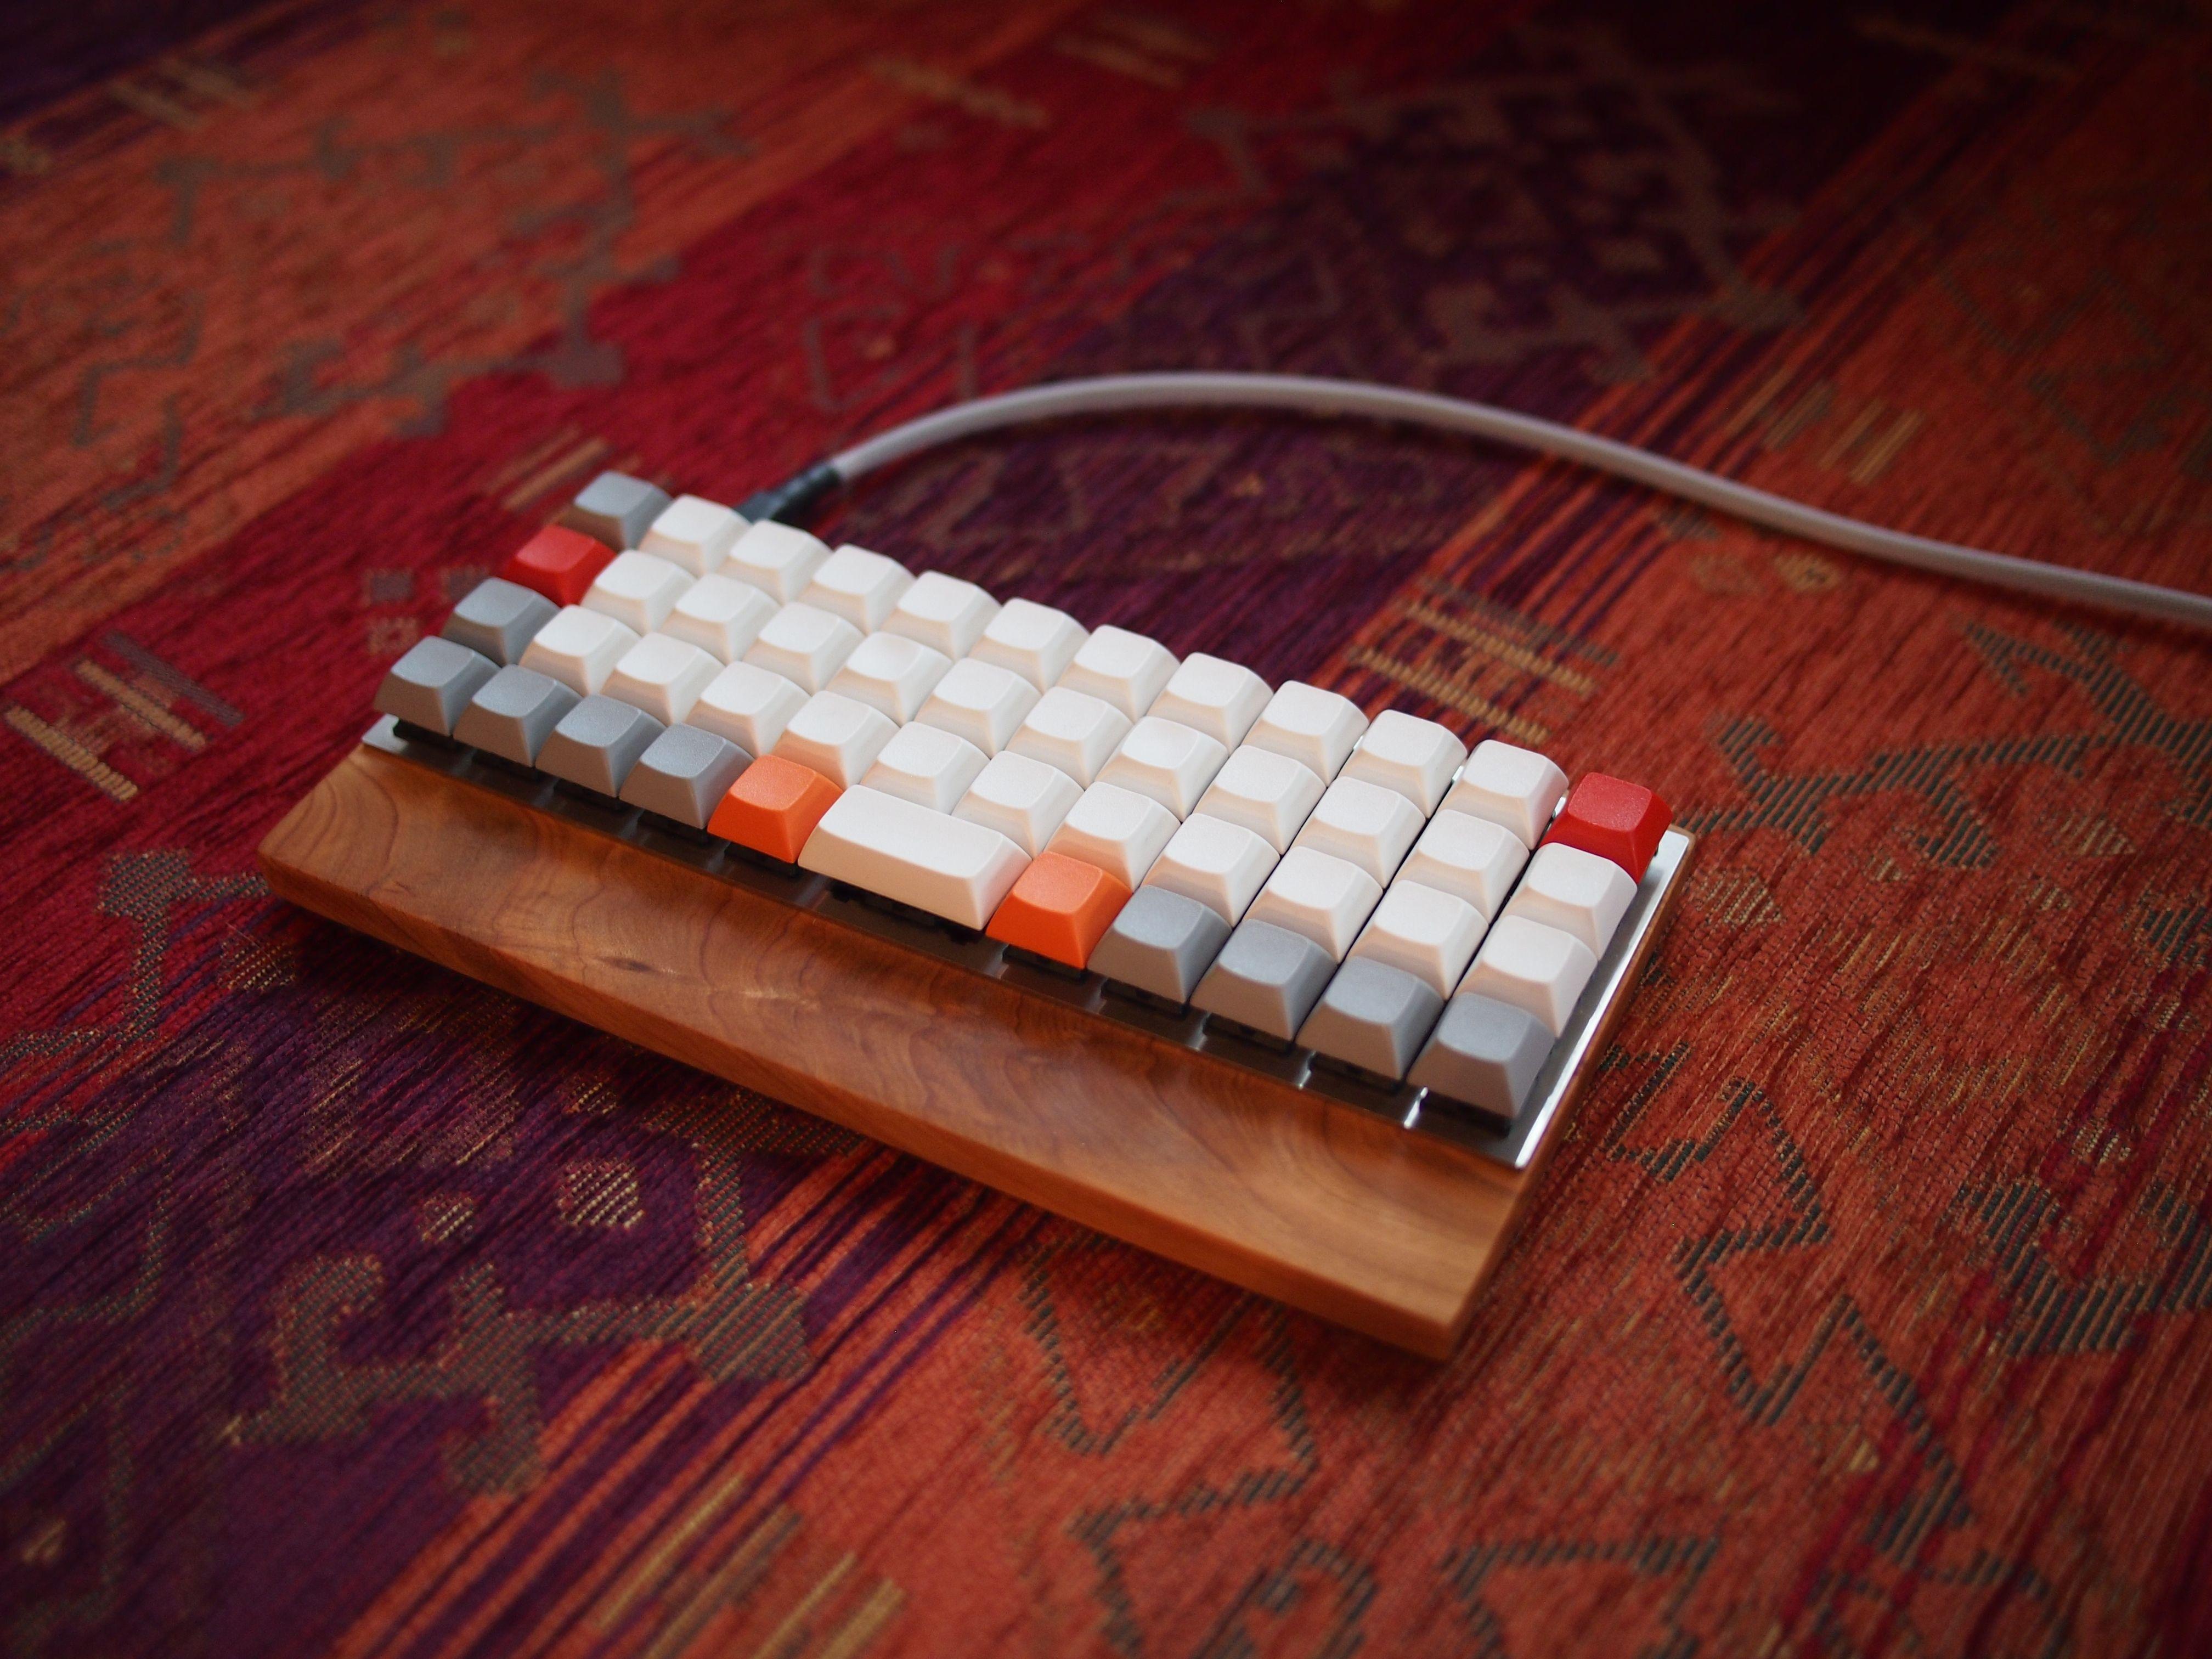 http://olkb.com/planck/ | Stuff/Keyboards | Pinterest